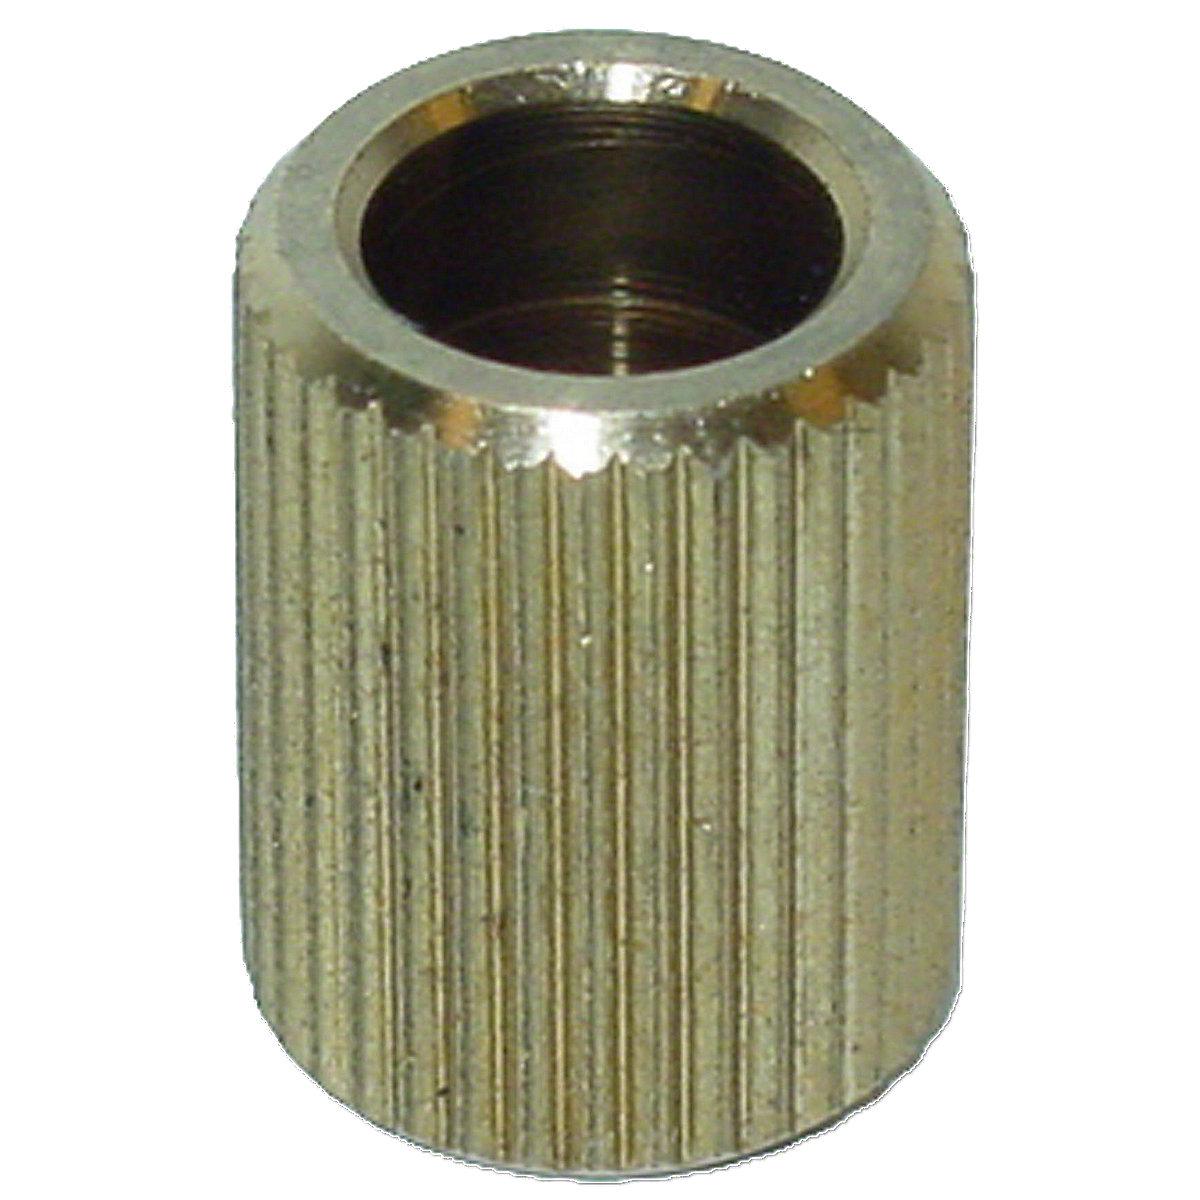 Throttle Body Repair Bushing For Massey Ferguson: TE20, TO20, TO30, 135, 2135, 150, 35, 202, 204, 50, F40, TO35, Massey Harris: Colt 21, Mustang 23, Pacer 16, 101 jr, 102 jr, 20, 22, 22k, 30, 50, 81, 82.